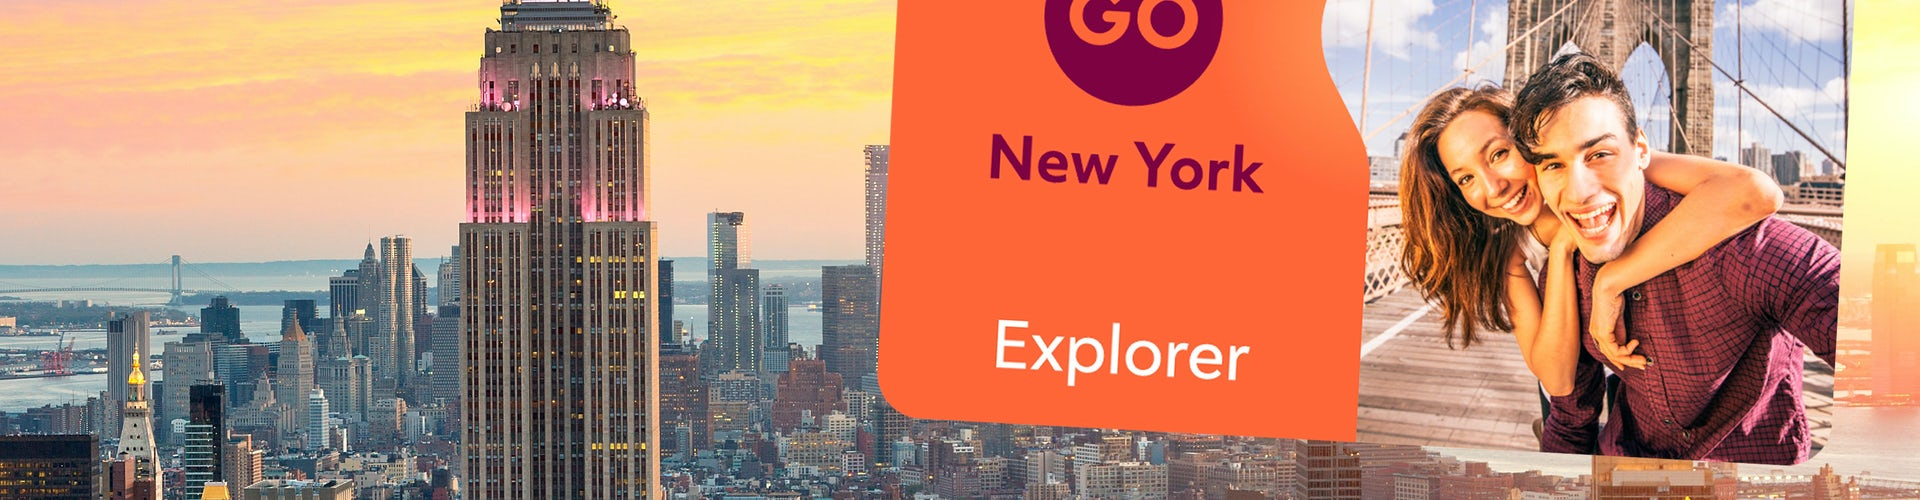 Go New York Explorer Pass 3